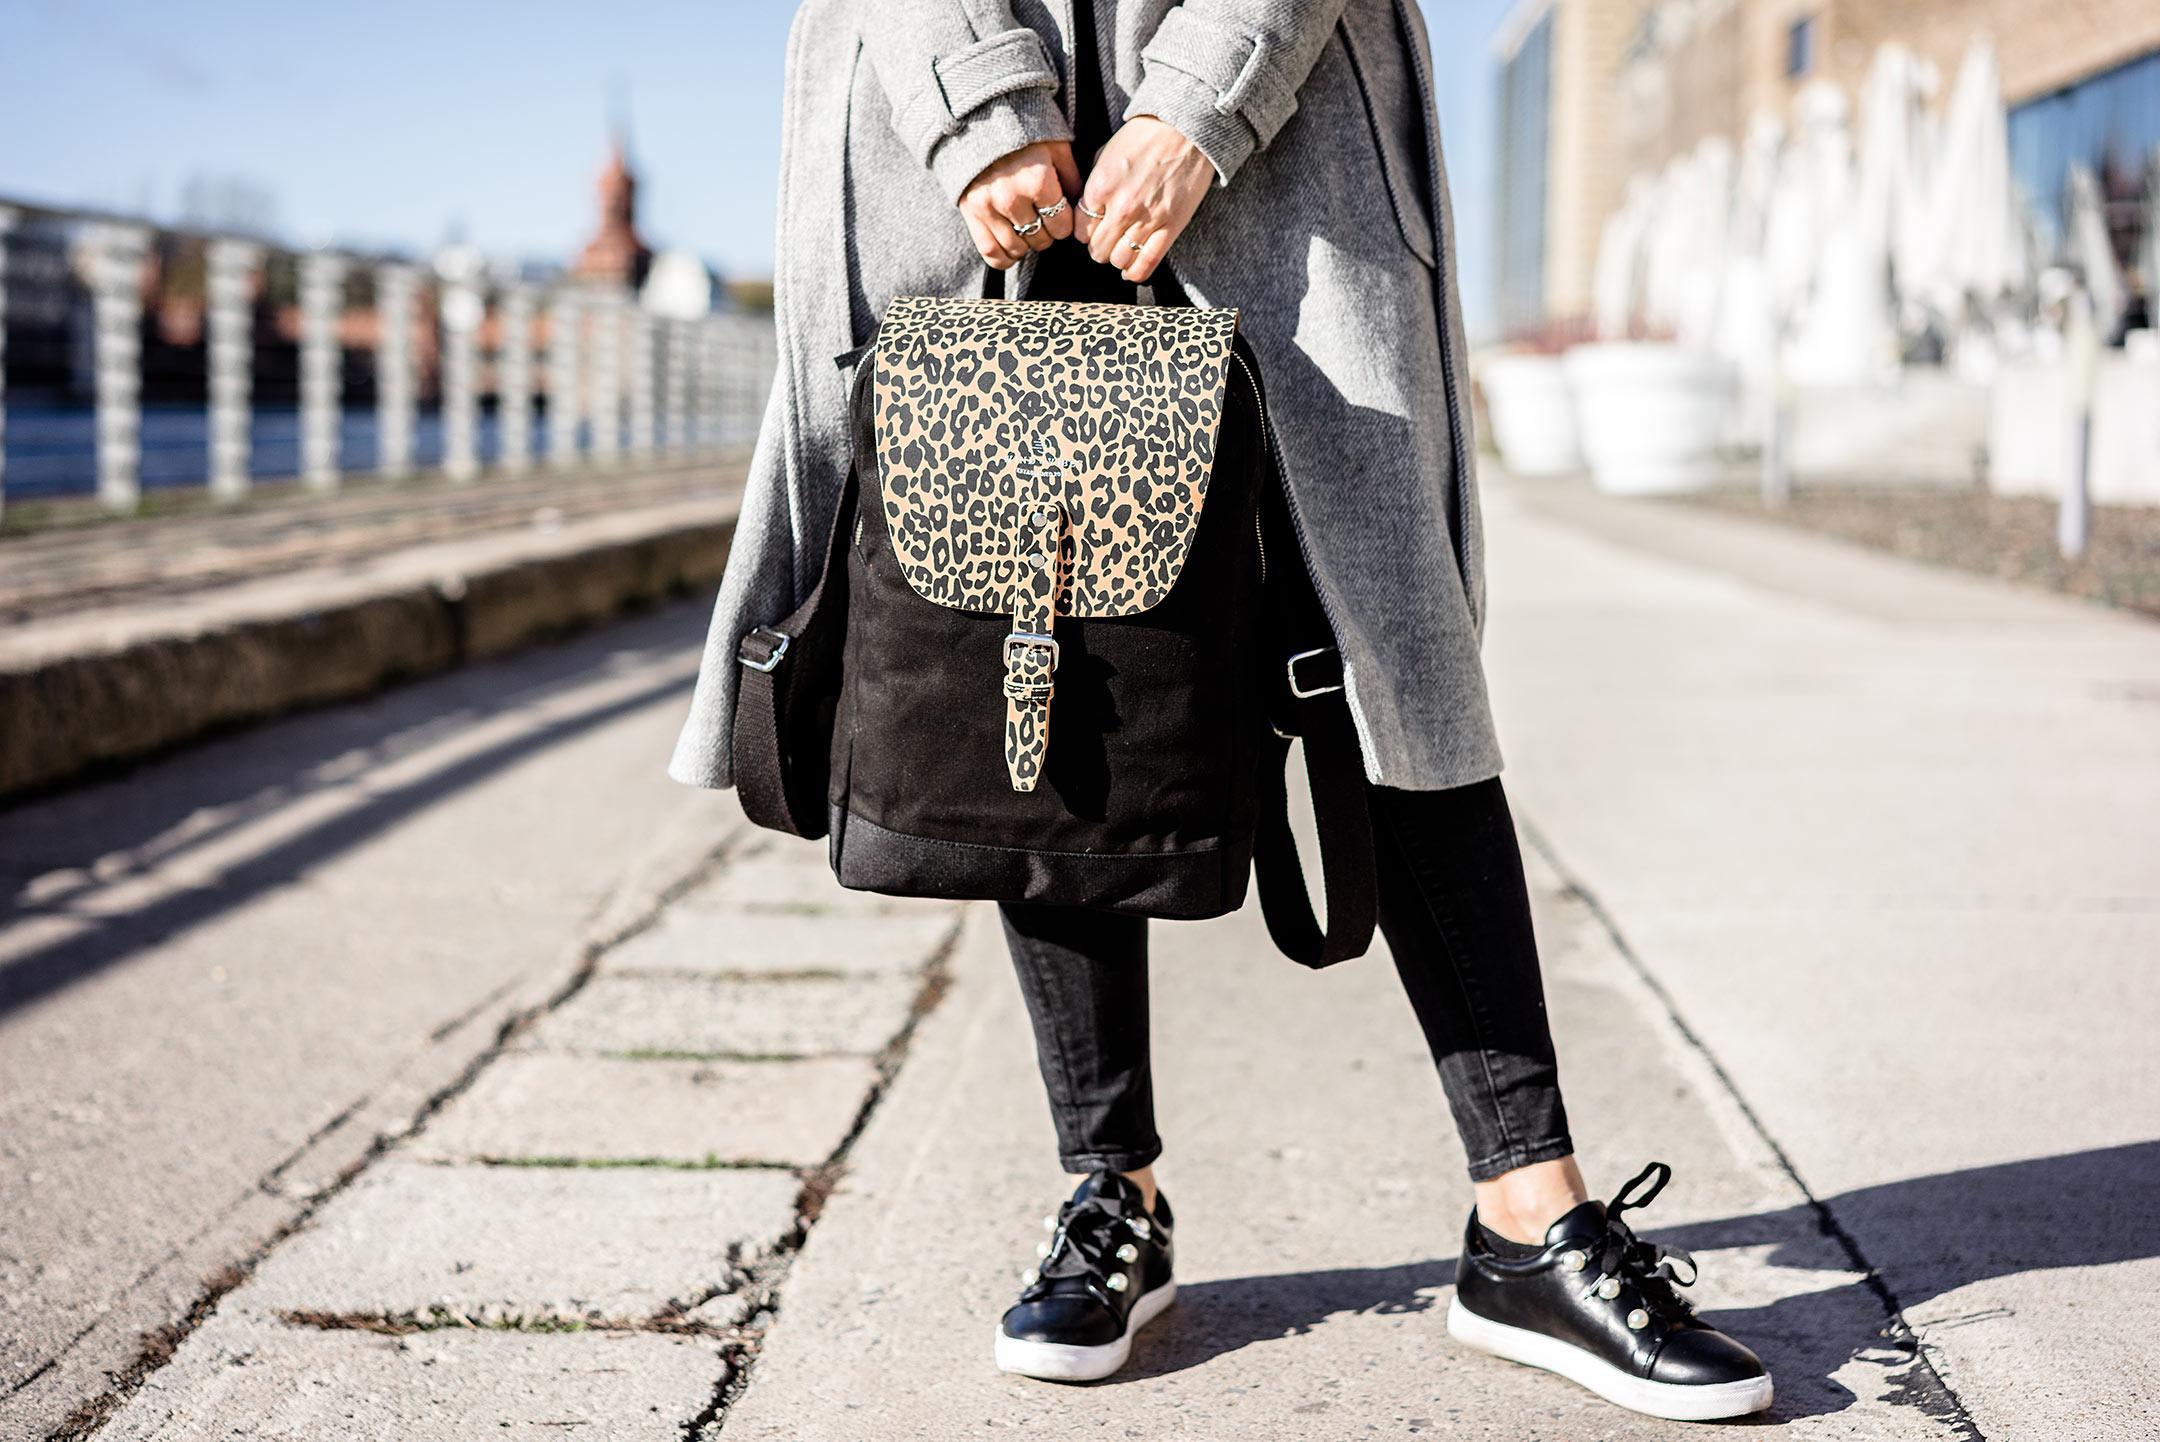 WIND & VIBES Rucksack Leooptik Flap schwarz Konfirgurator Modeblog Sunnyinga